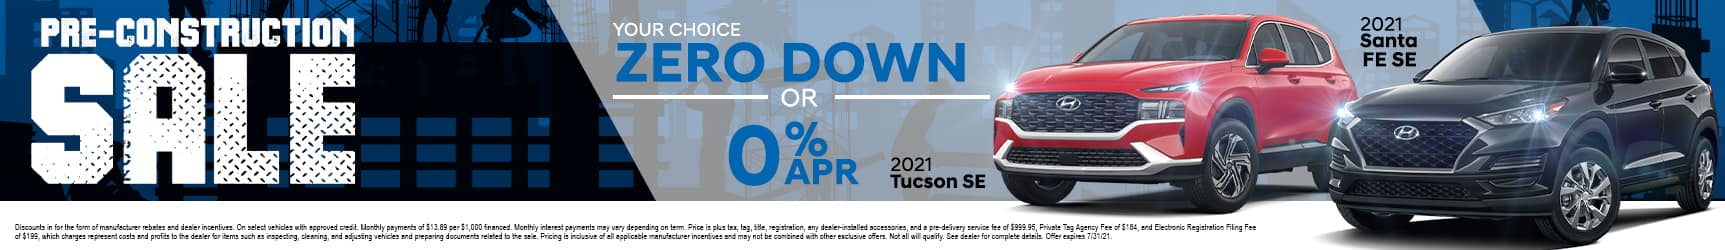 10145-0621-BHY1013_1725x250_TucsonSantaFE